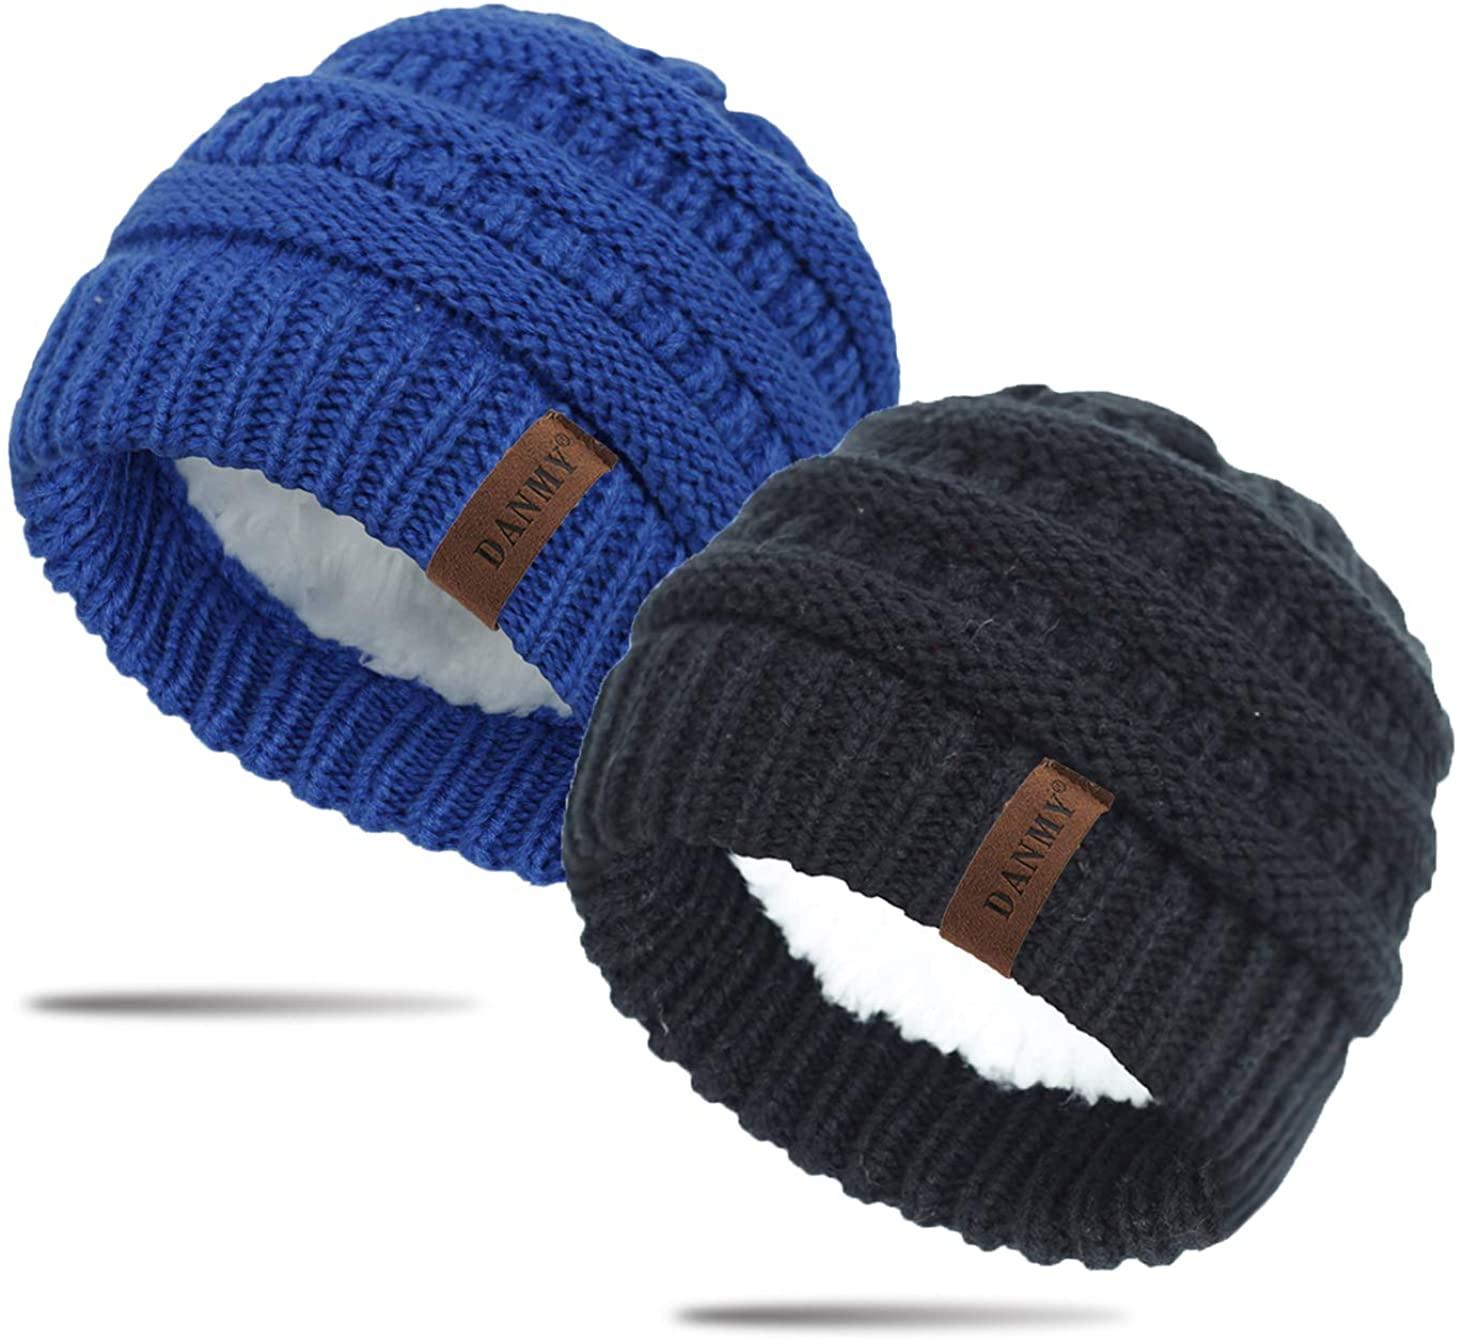 DANMY Baby Beanie Hat,Fleece Lined Infant Newborn Toddler Winter Warm Knit Cap for Little Boys Girls, Winter Warm Hat